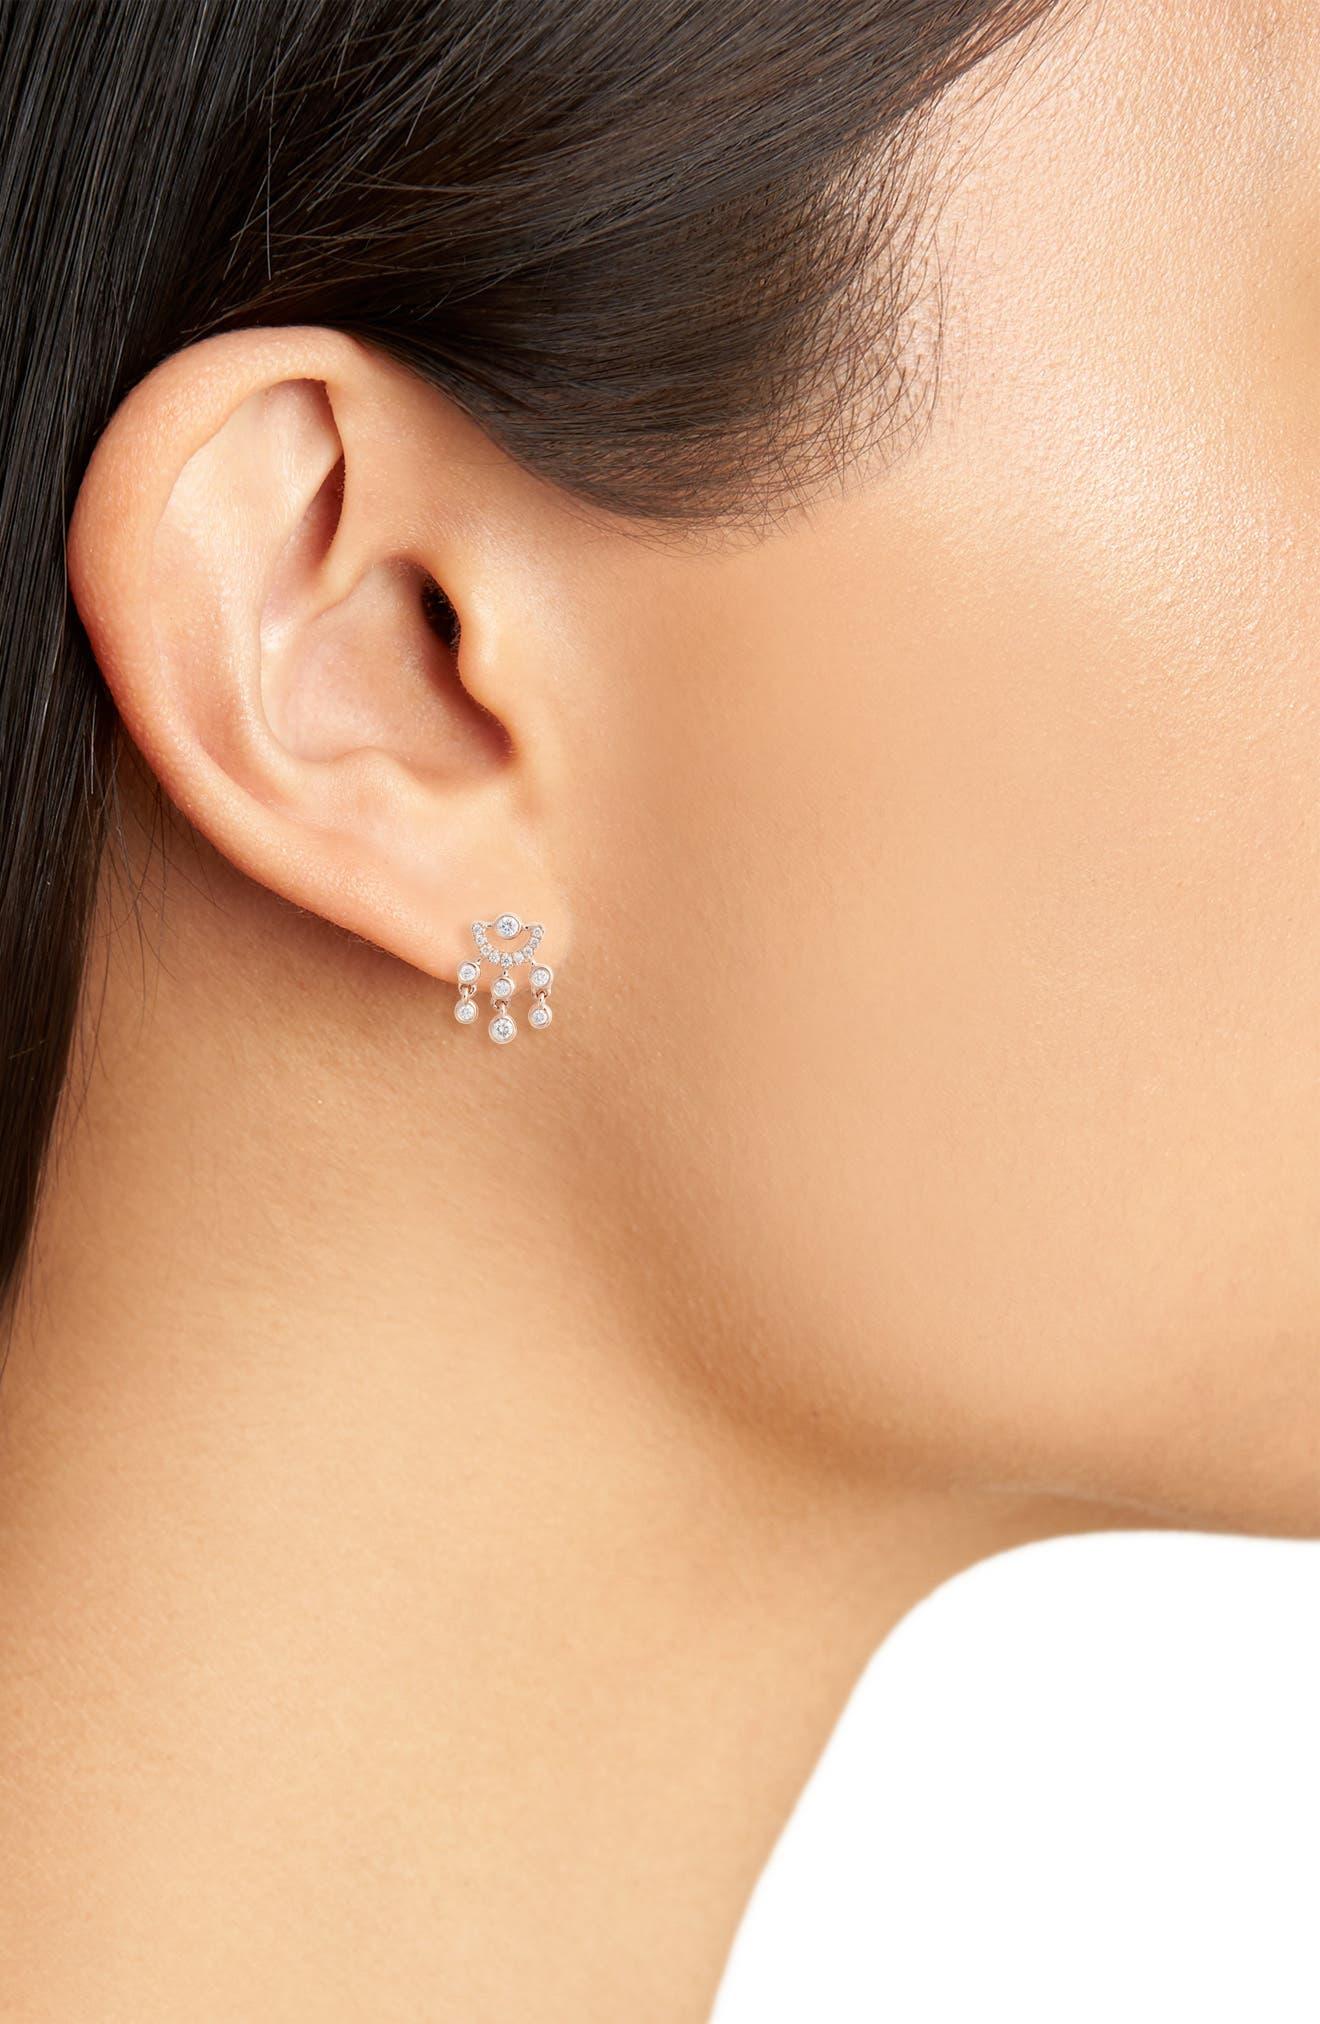 Lulu Jack Diamond Drop Earrings,                             Alternate thumbnail 2, color,                             Rose Gold